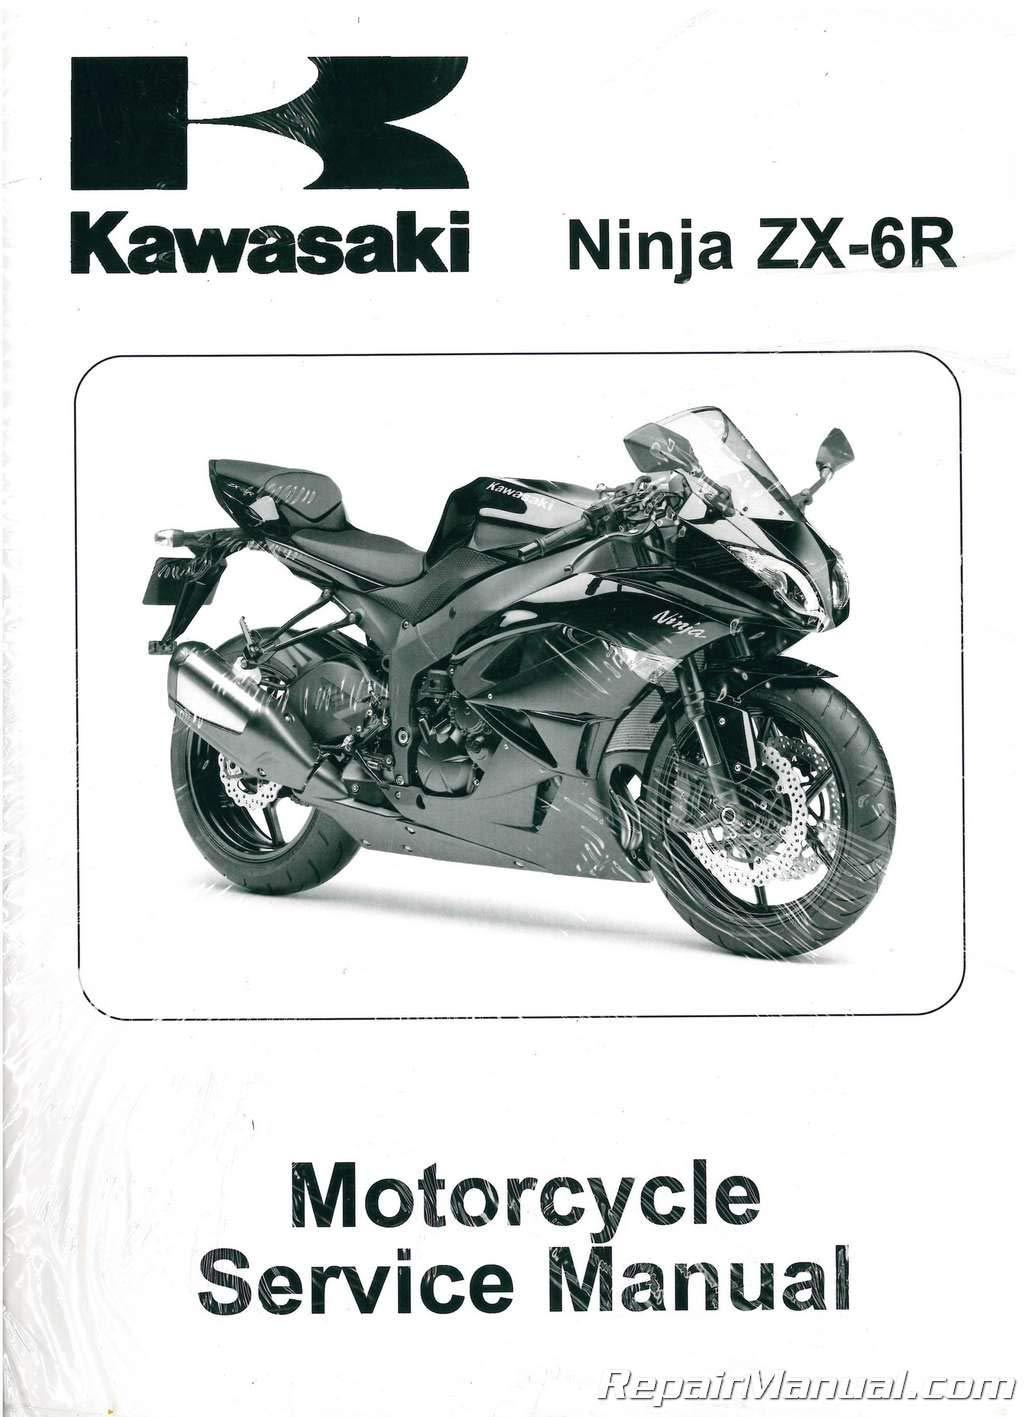 99924-1417-03 2009-2011 Kawasaki ZX600R Ninja ZX-6R Service ...